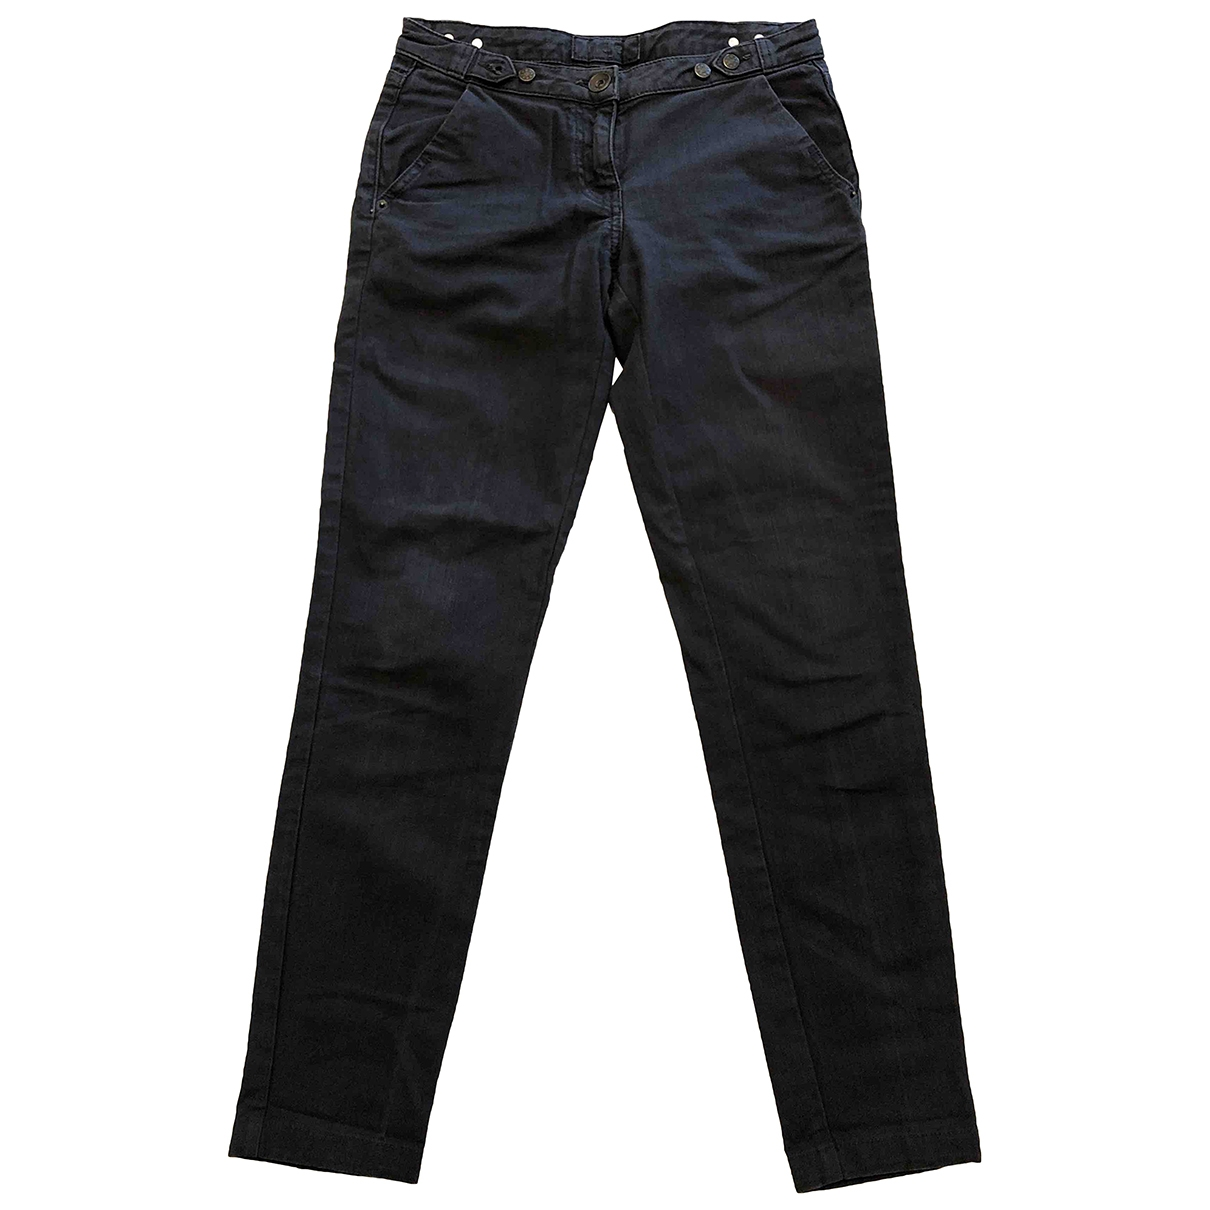 Maje \N Grey Denim - Jeans Jeans for Women 24 US